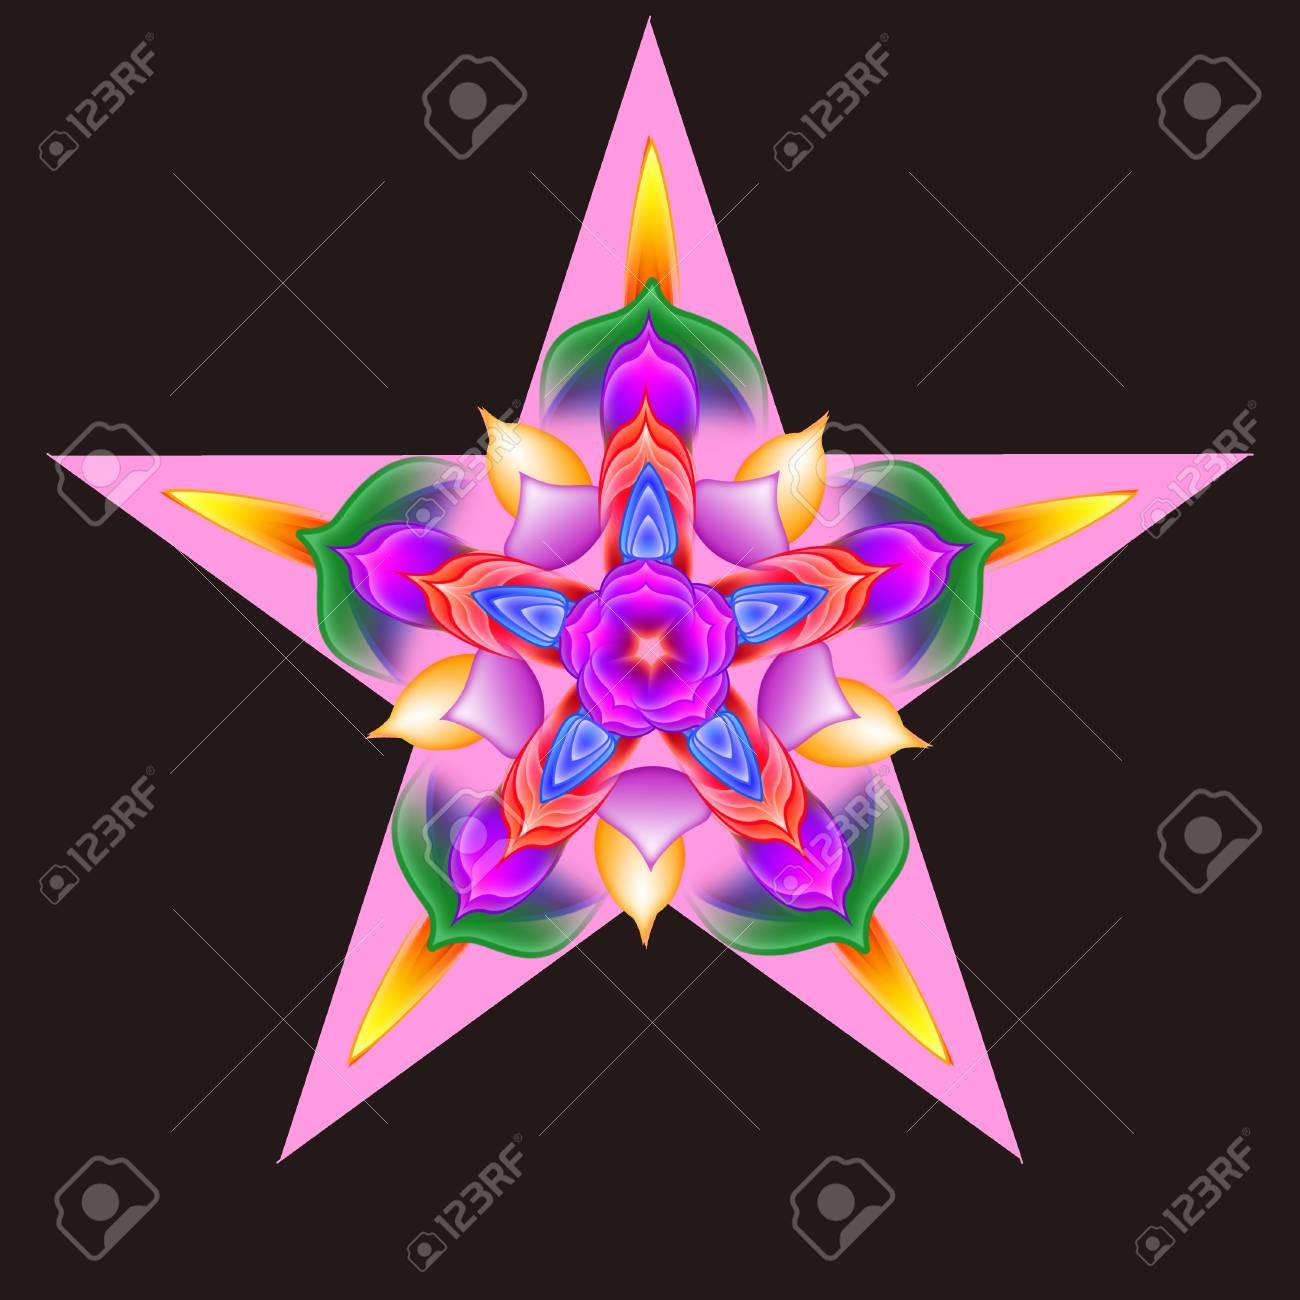 /varios colores 5/Star 12,5/x 50/mm /índice de colores brillantes flecha/ 5/paquetes de 20